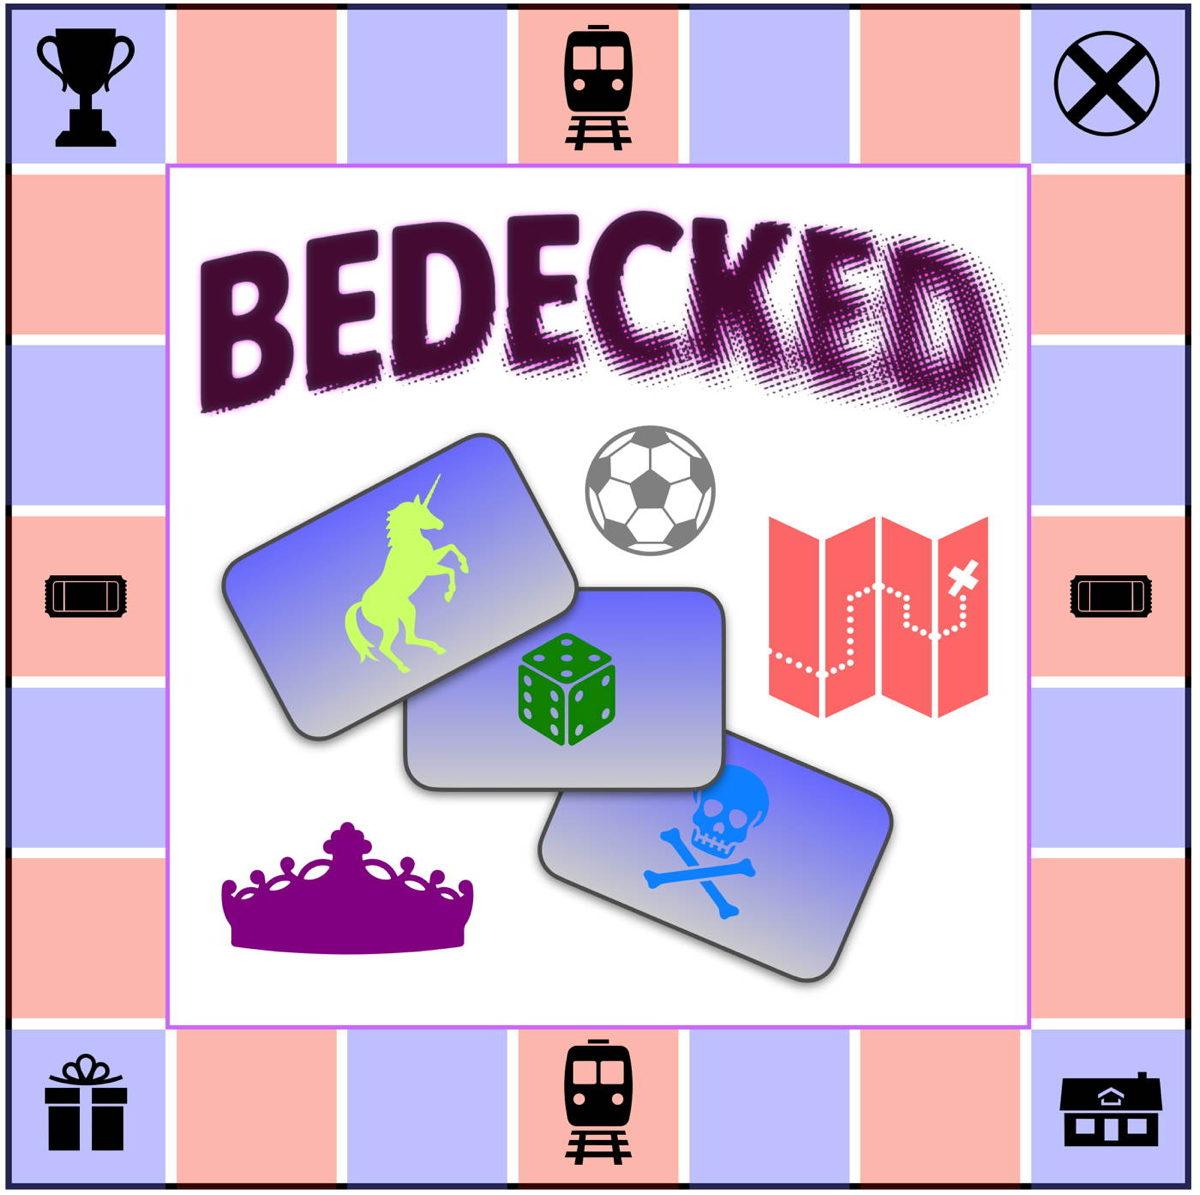 bedeckedboard-sm.jpg